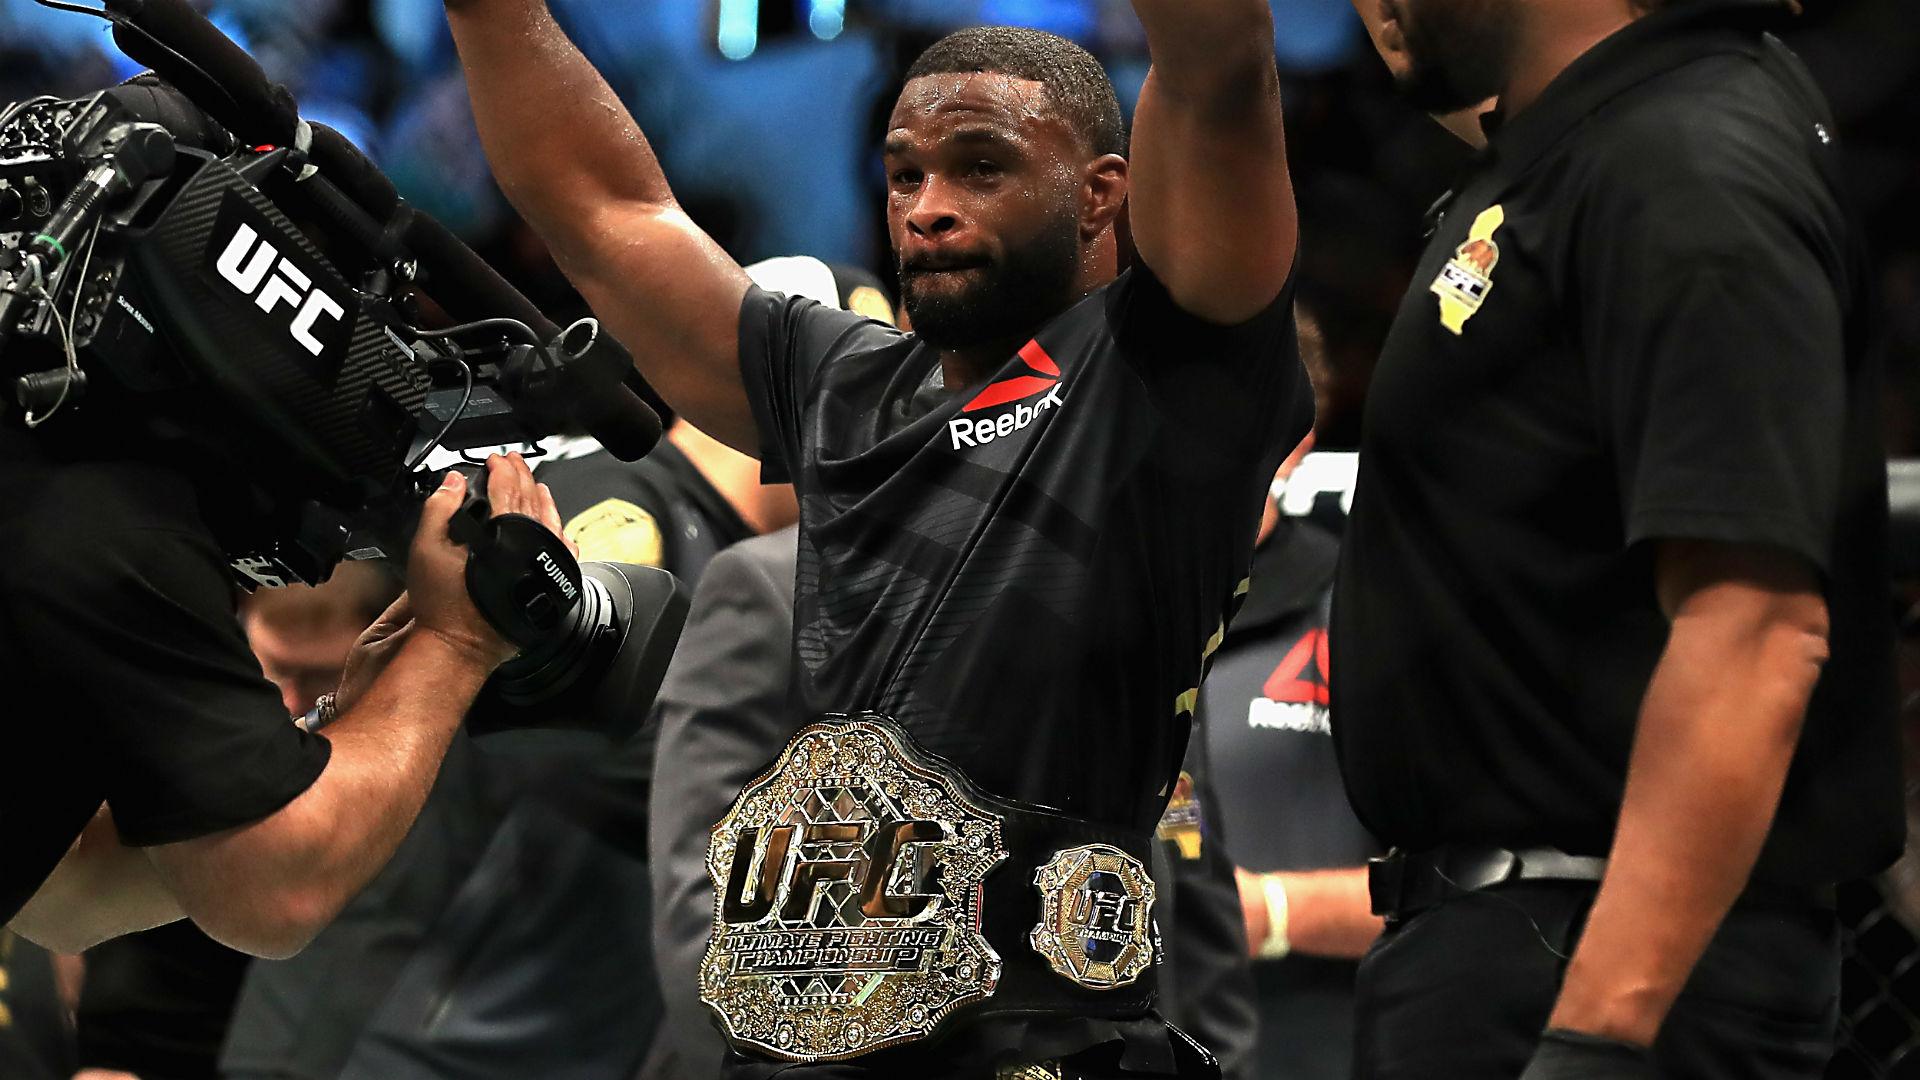 UFC 228: Tyron Woodley vs. Darren Till welterweight title fight to headline Dallas card